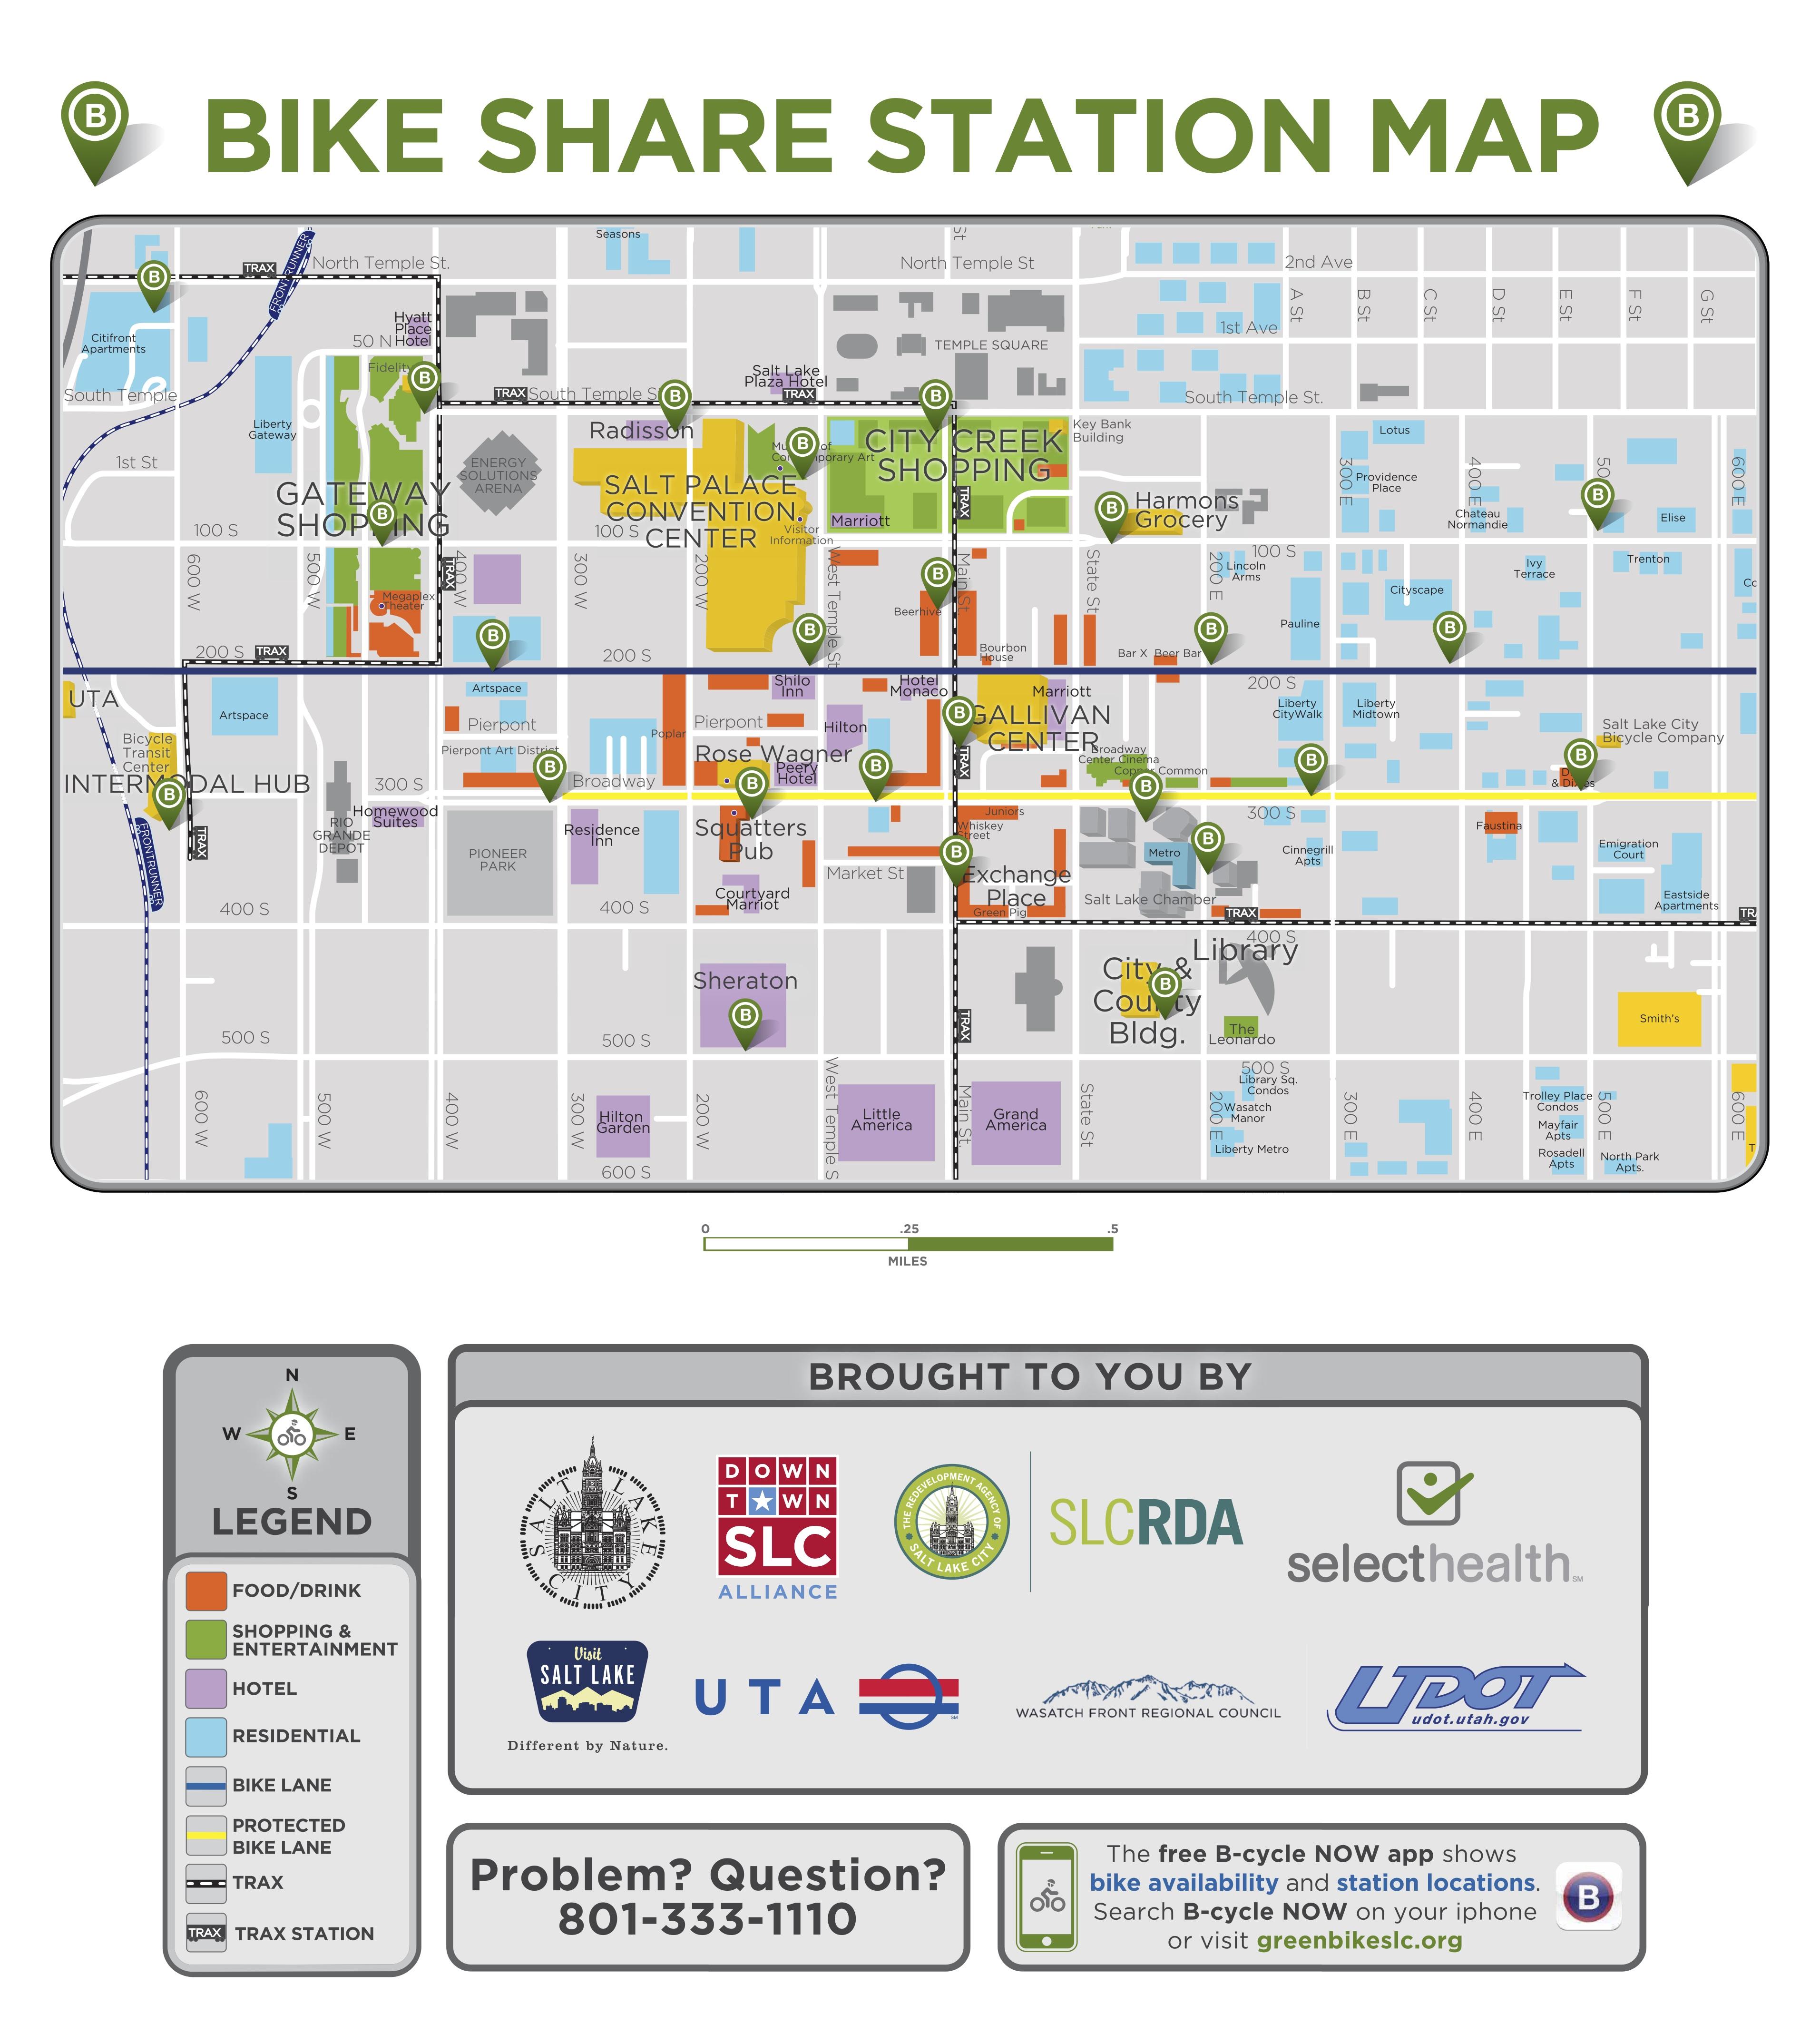 Greenbike Station Map in Salt Lake City, Utah.